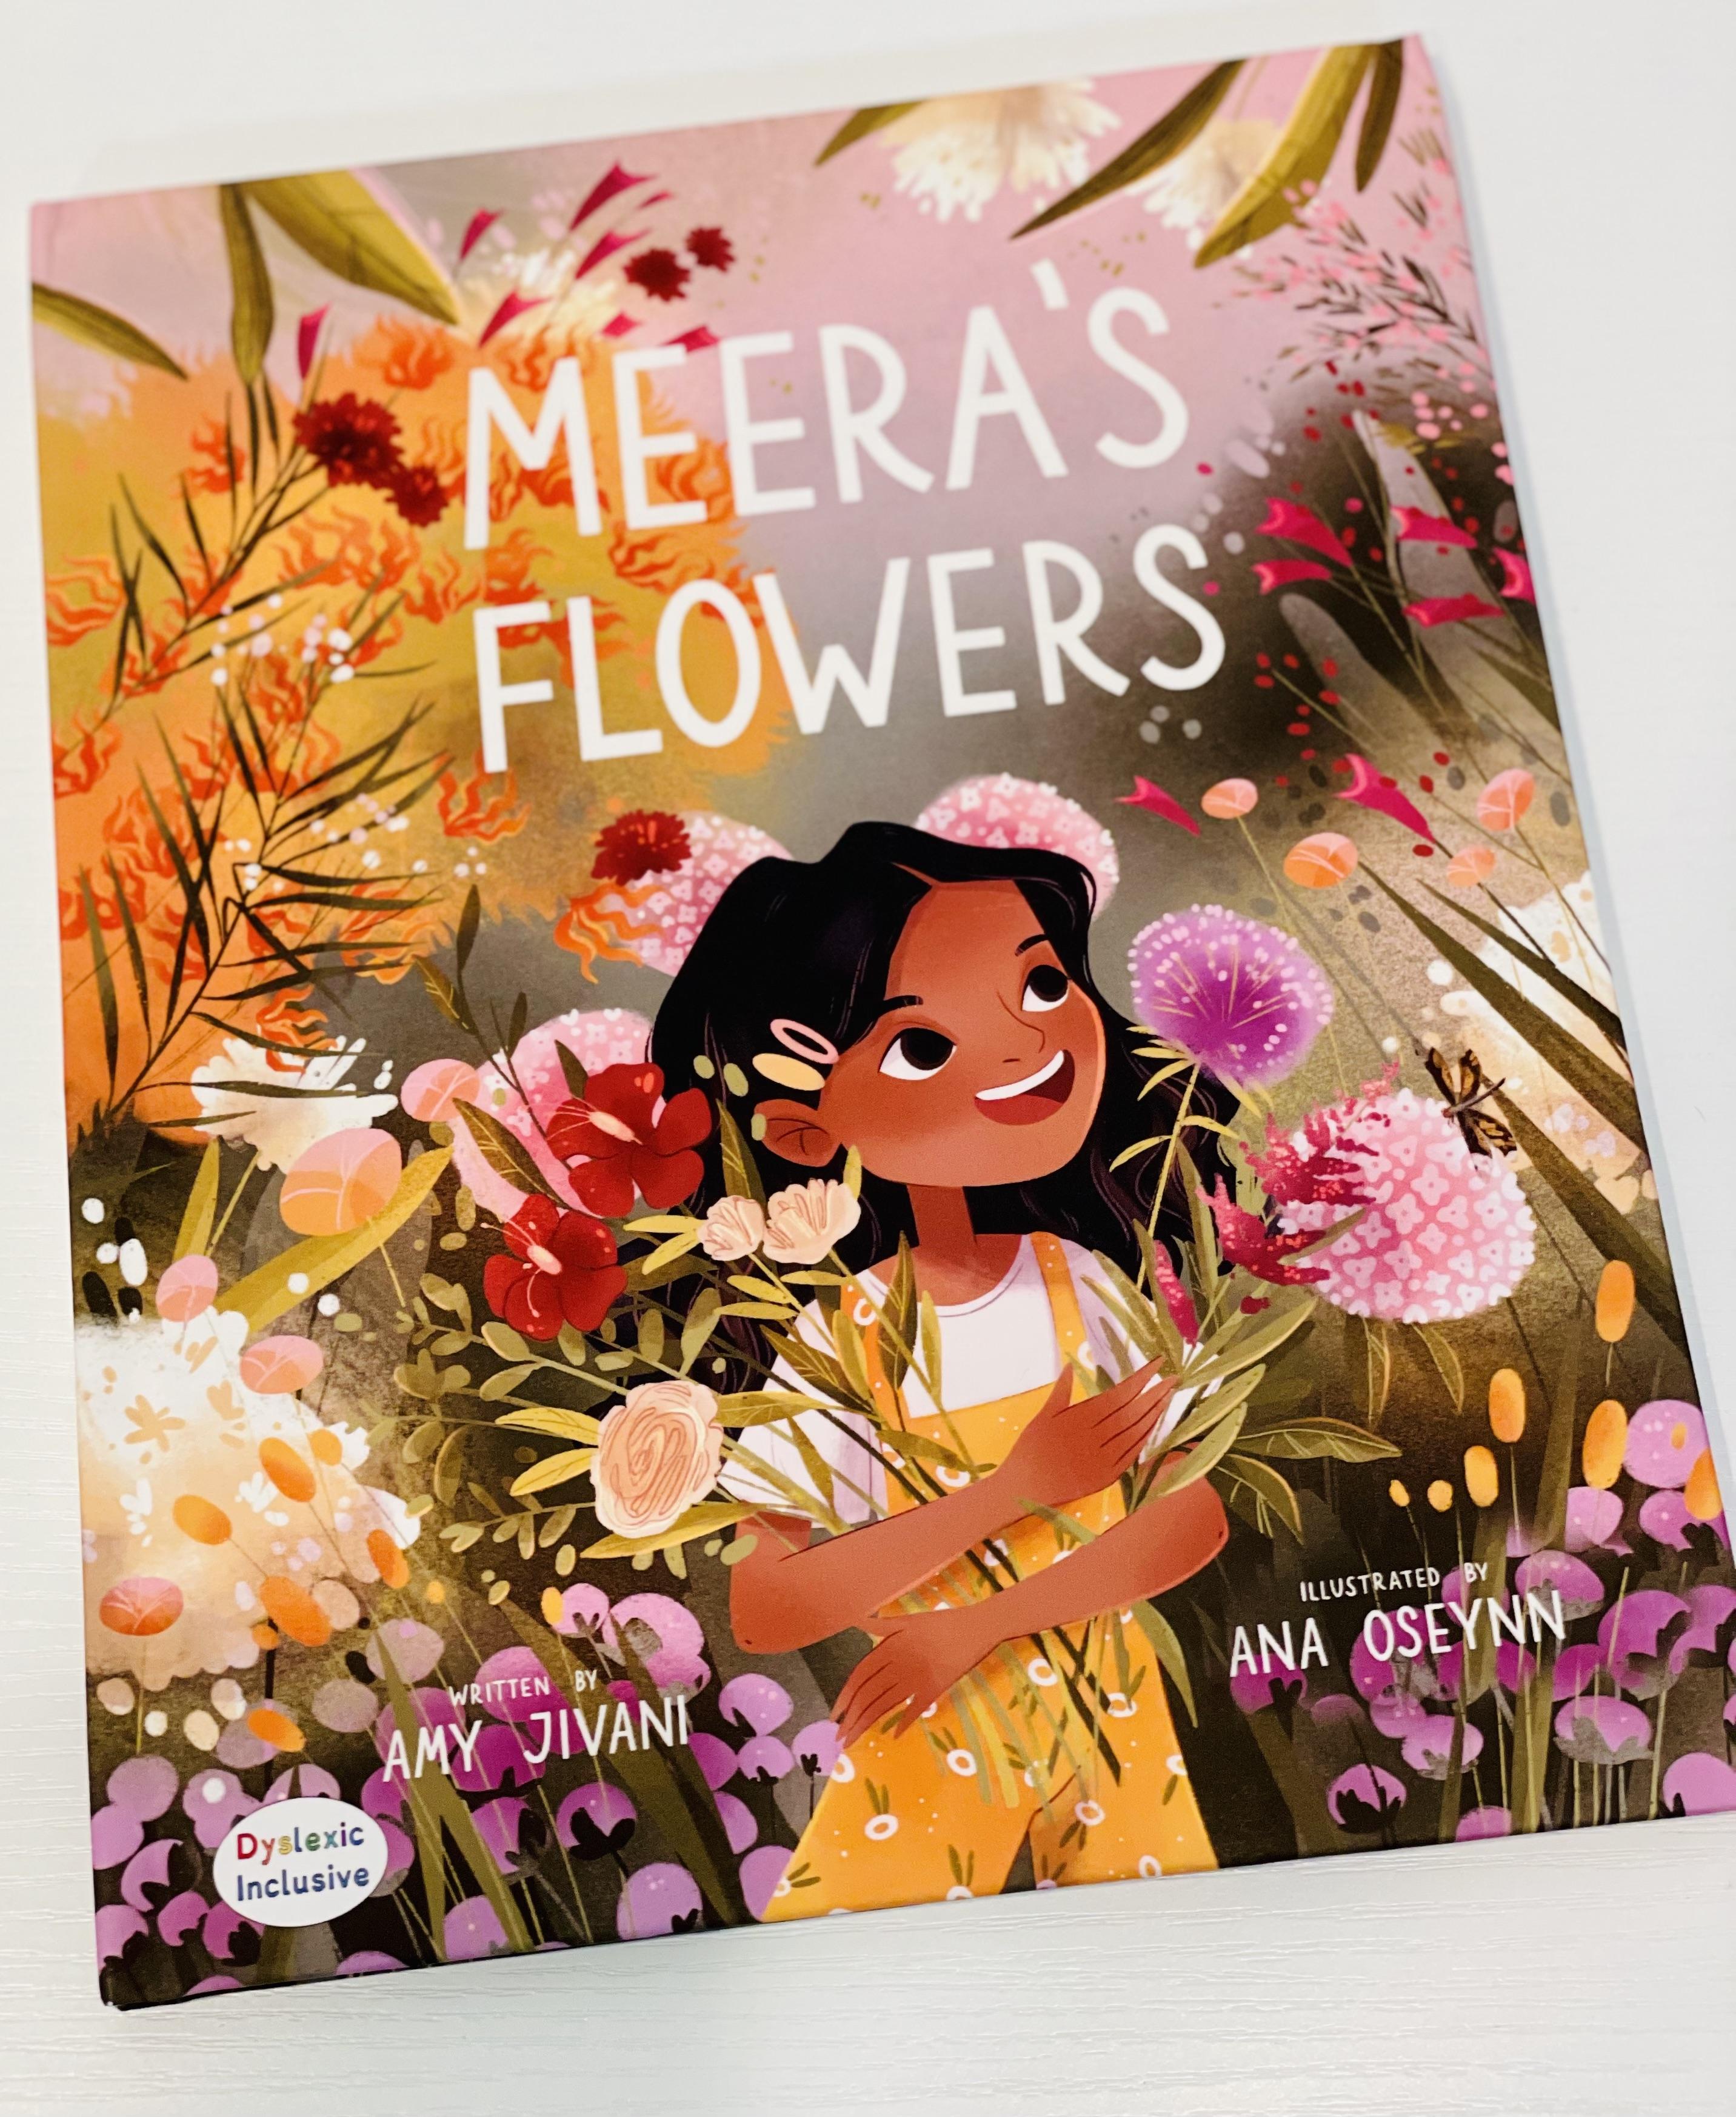 Meera's Flowers